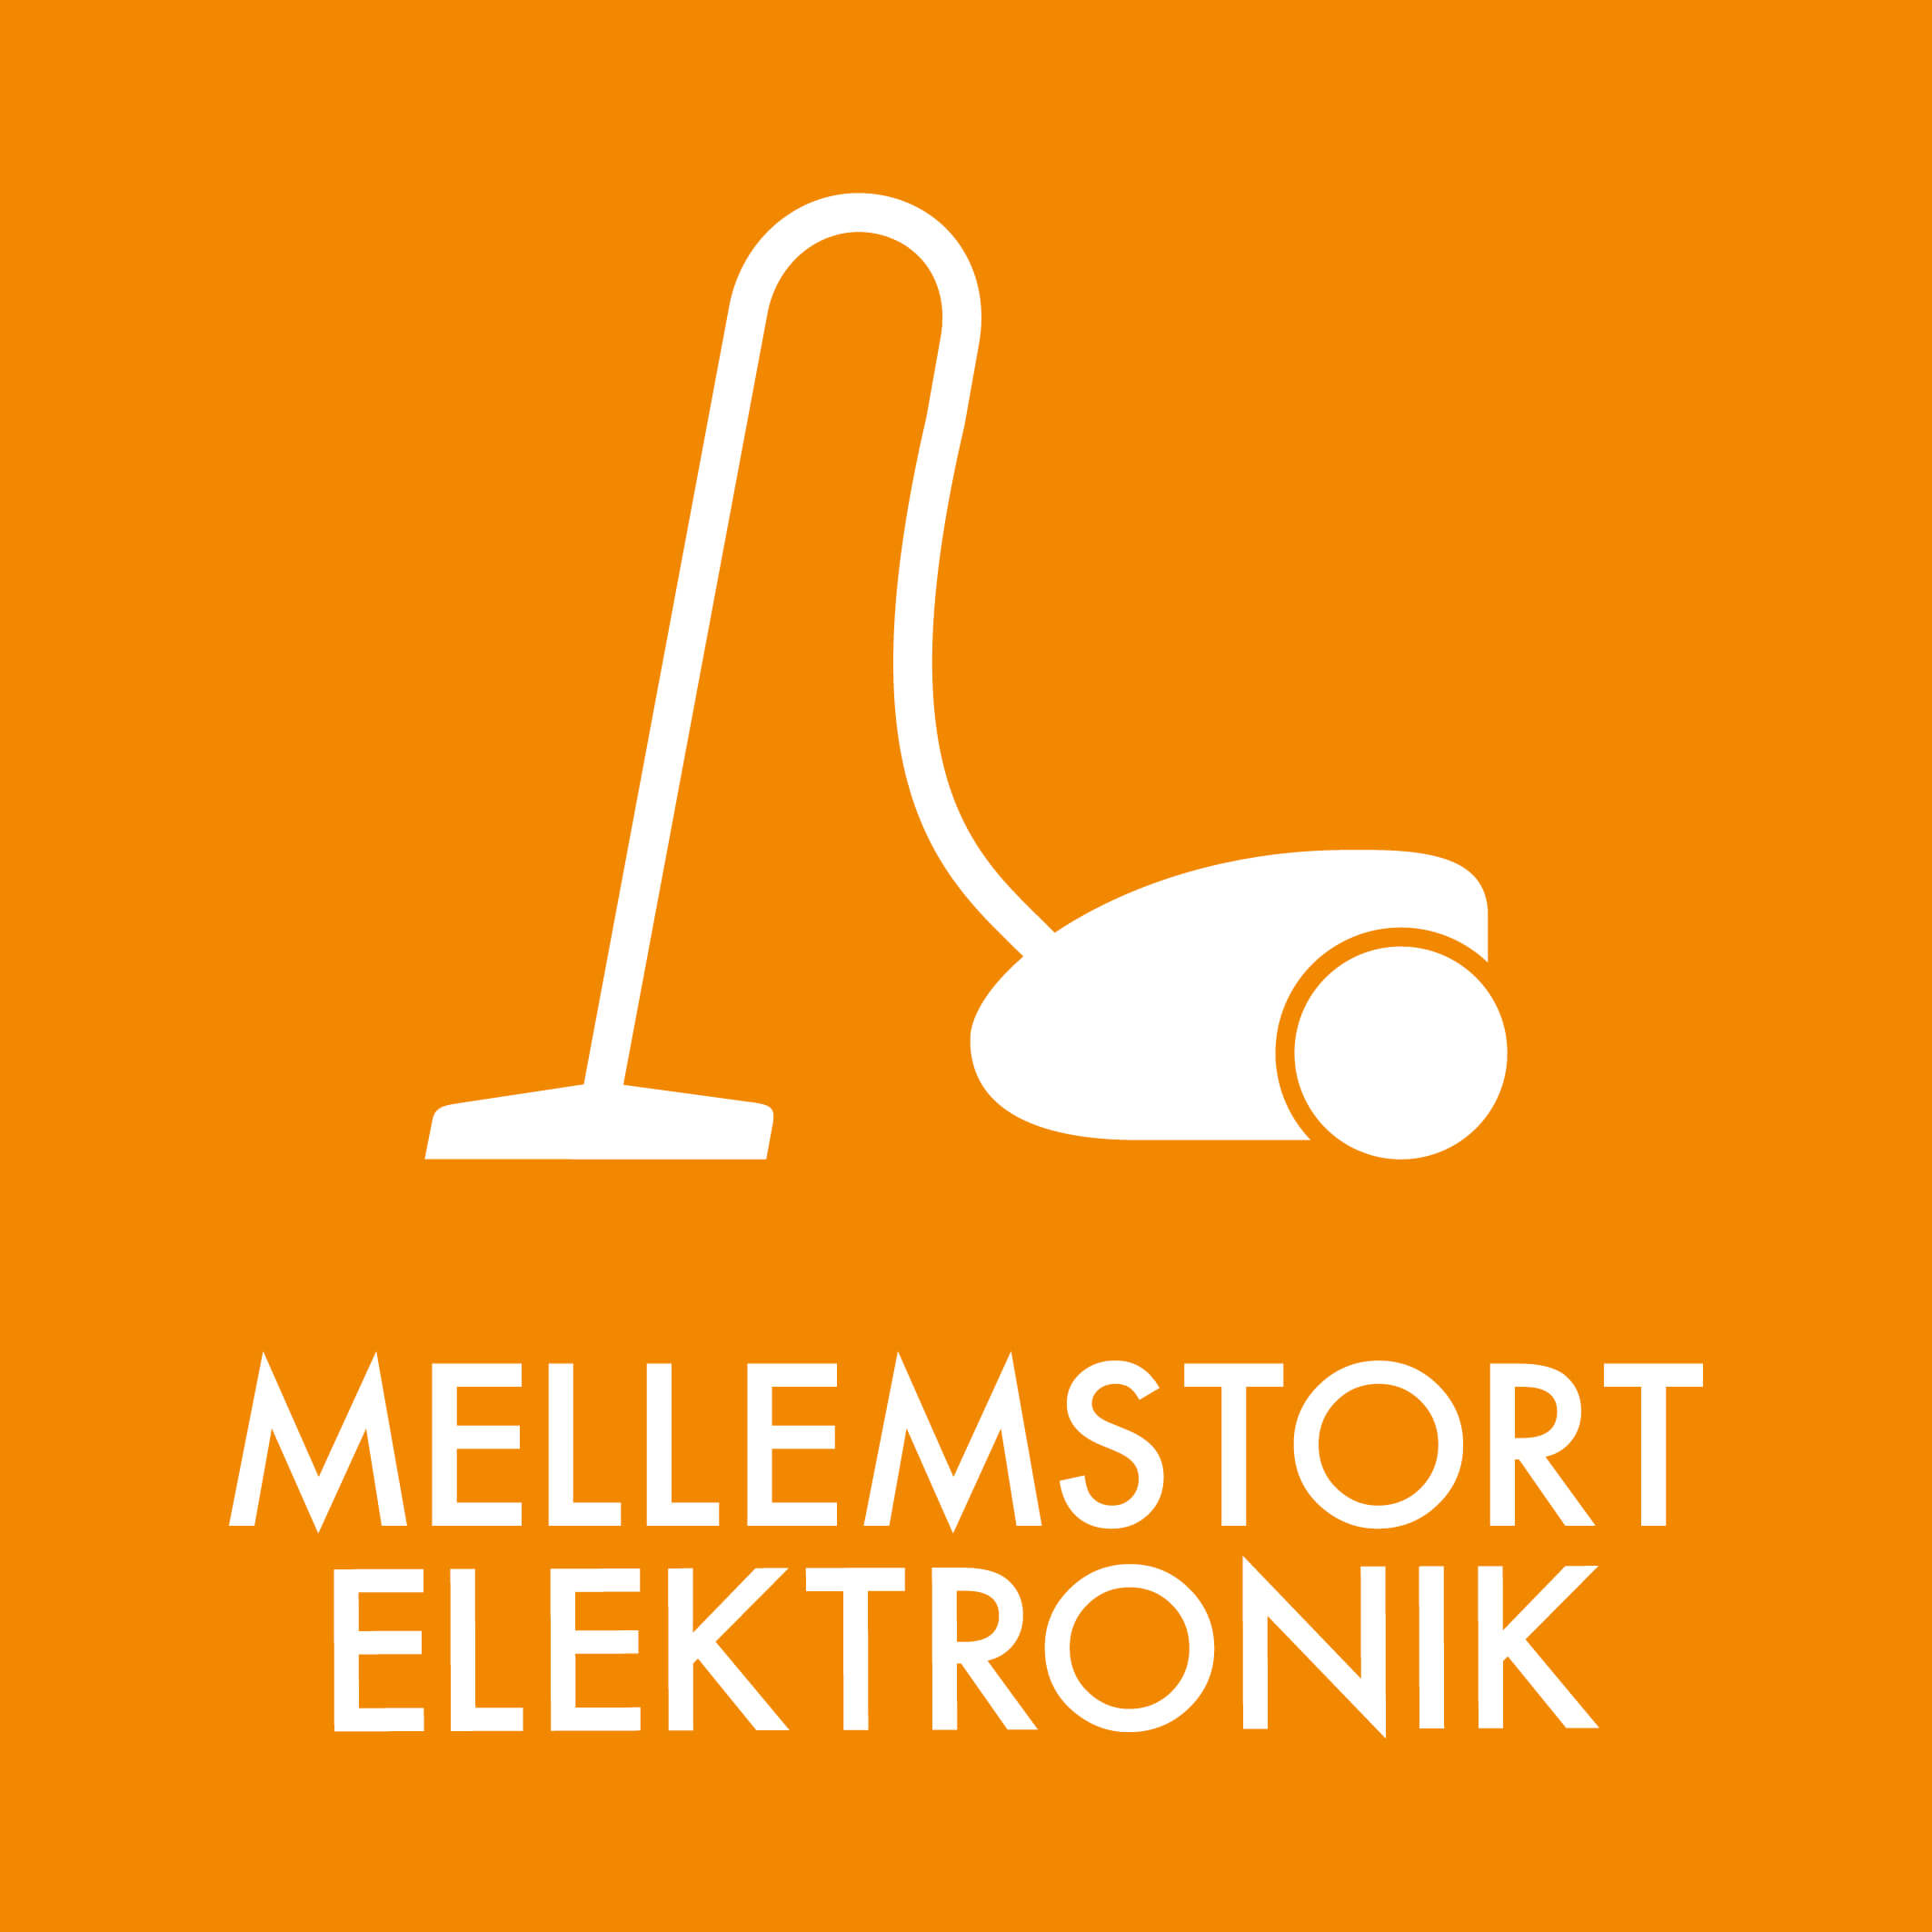 Dansk Affaldssortering - Mellemstort elektronik